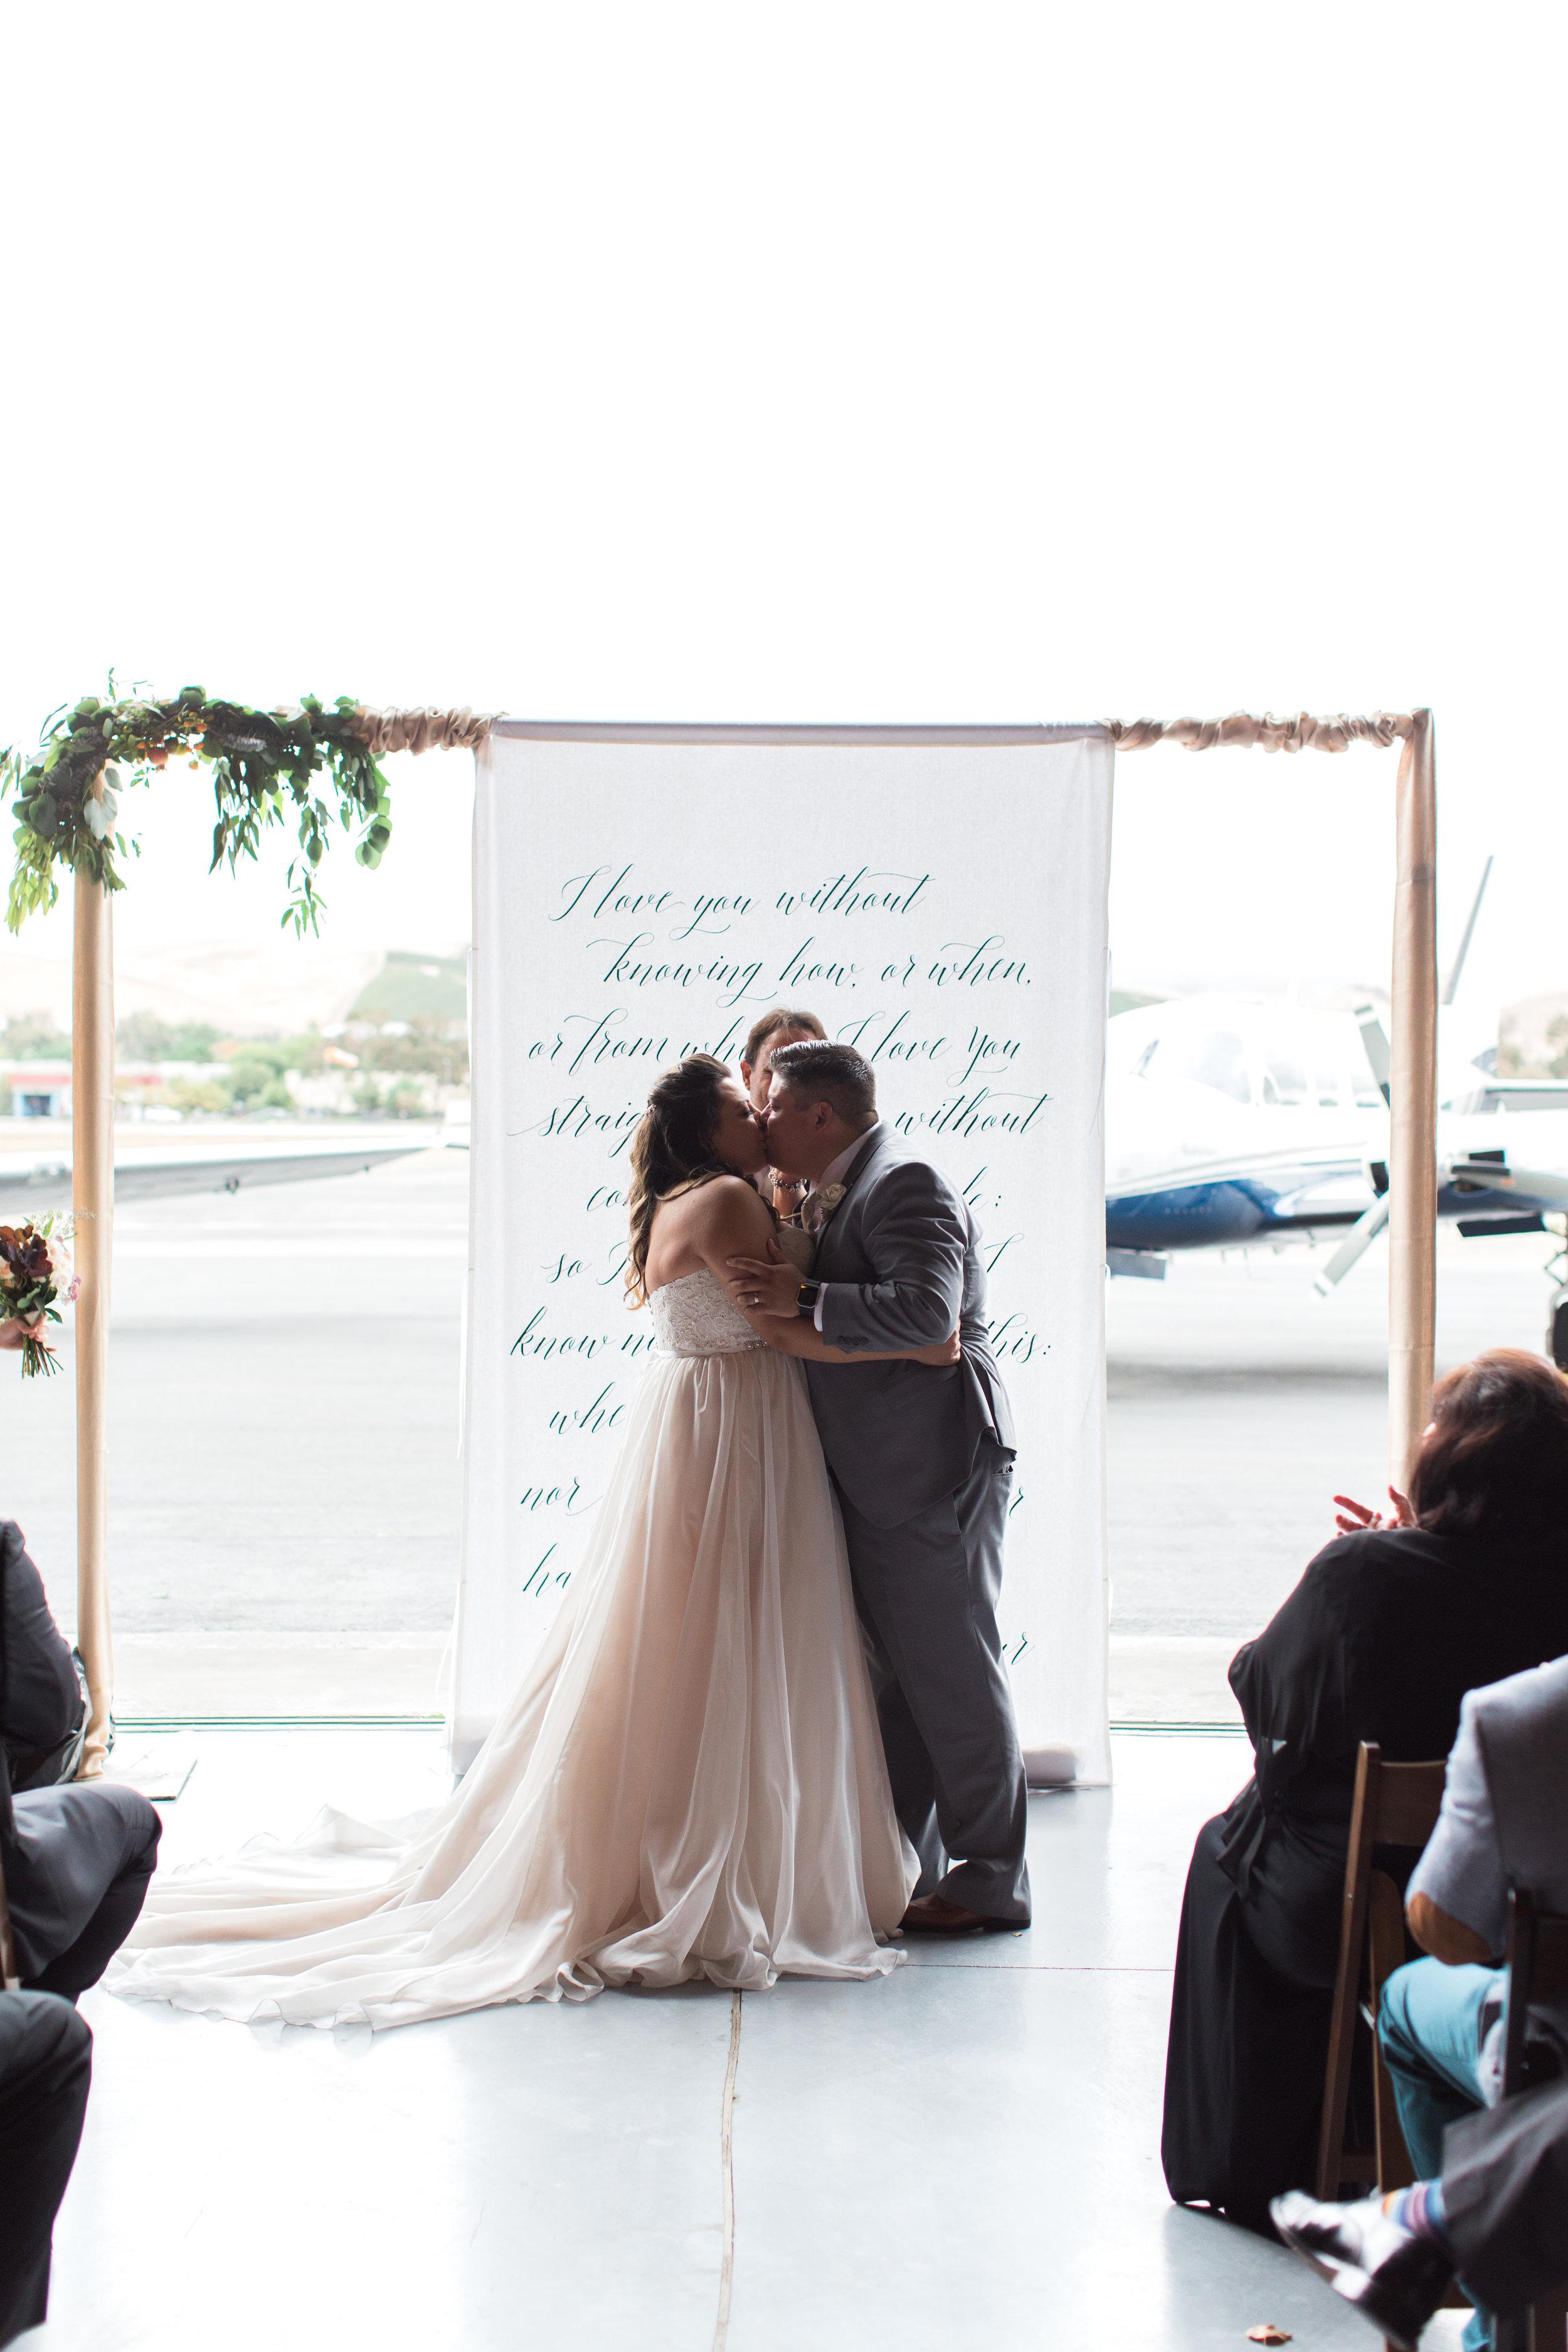 airport-hanger-wedding-at-attitude-aviation-in-livermore-66.jpg